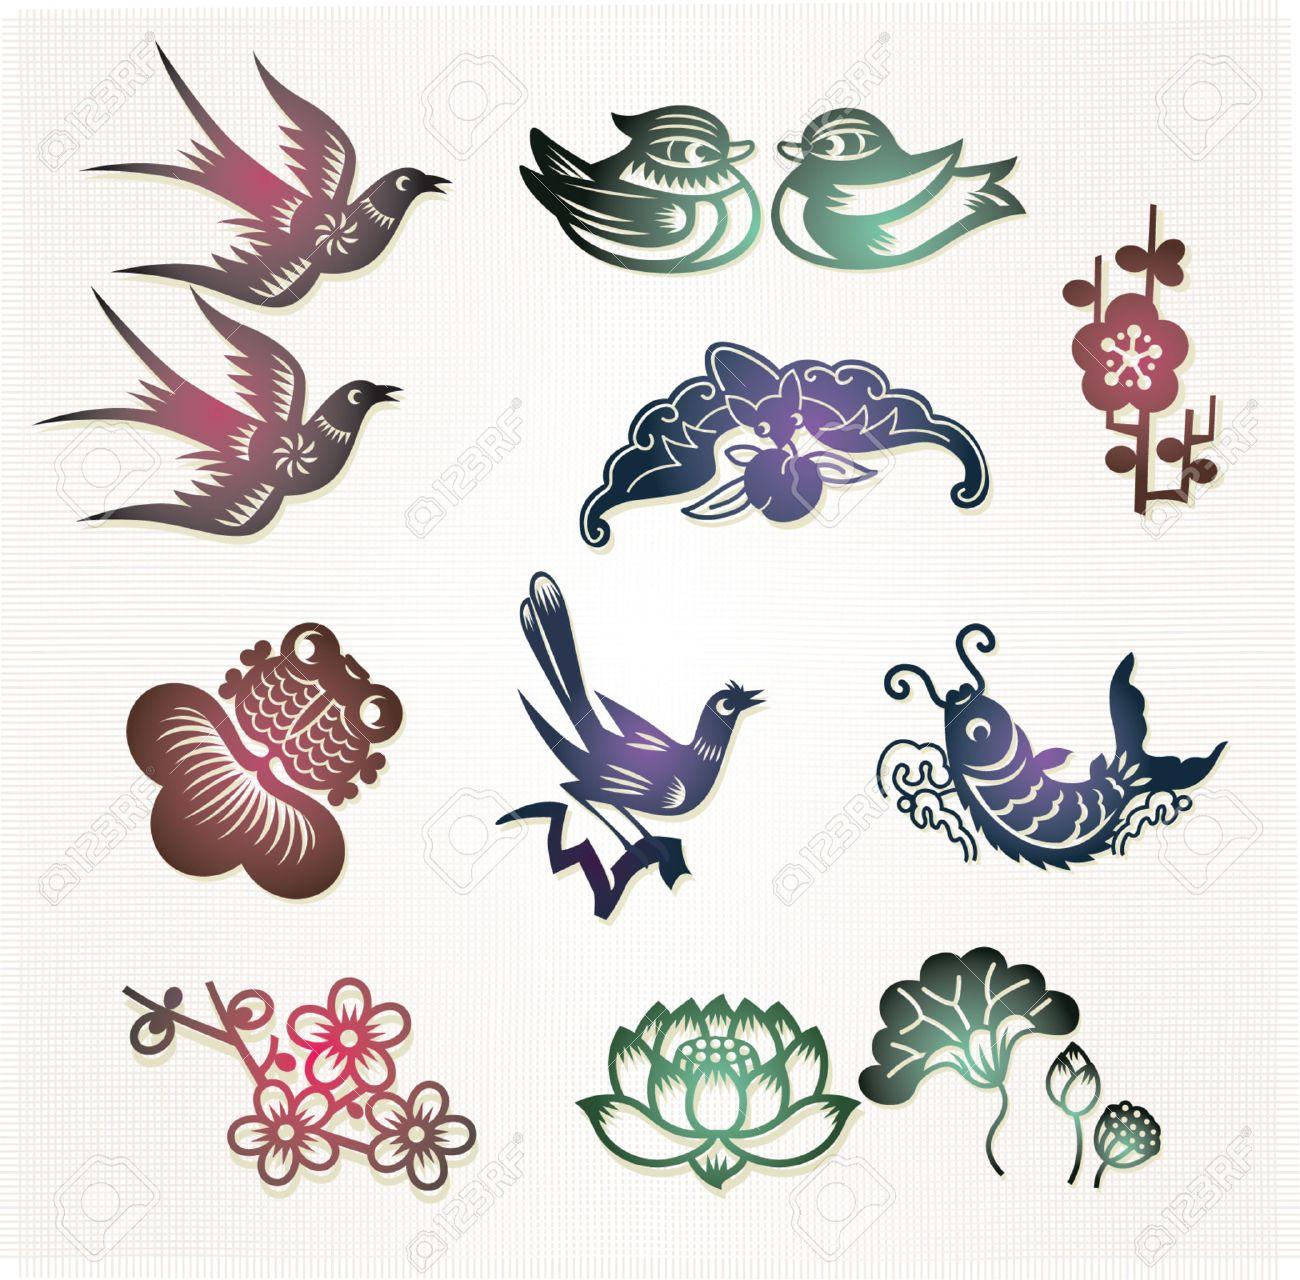 Traditional Chinese Lucky Symbols Lovebirds Mandarin Ducksloyal